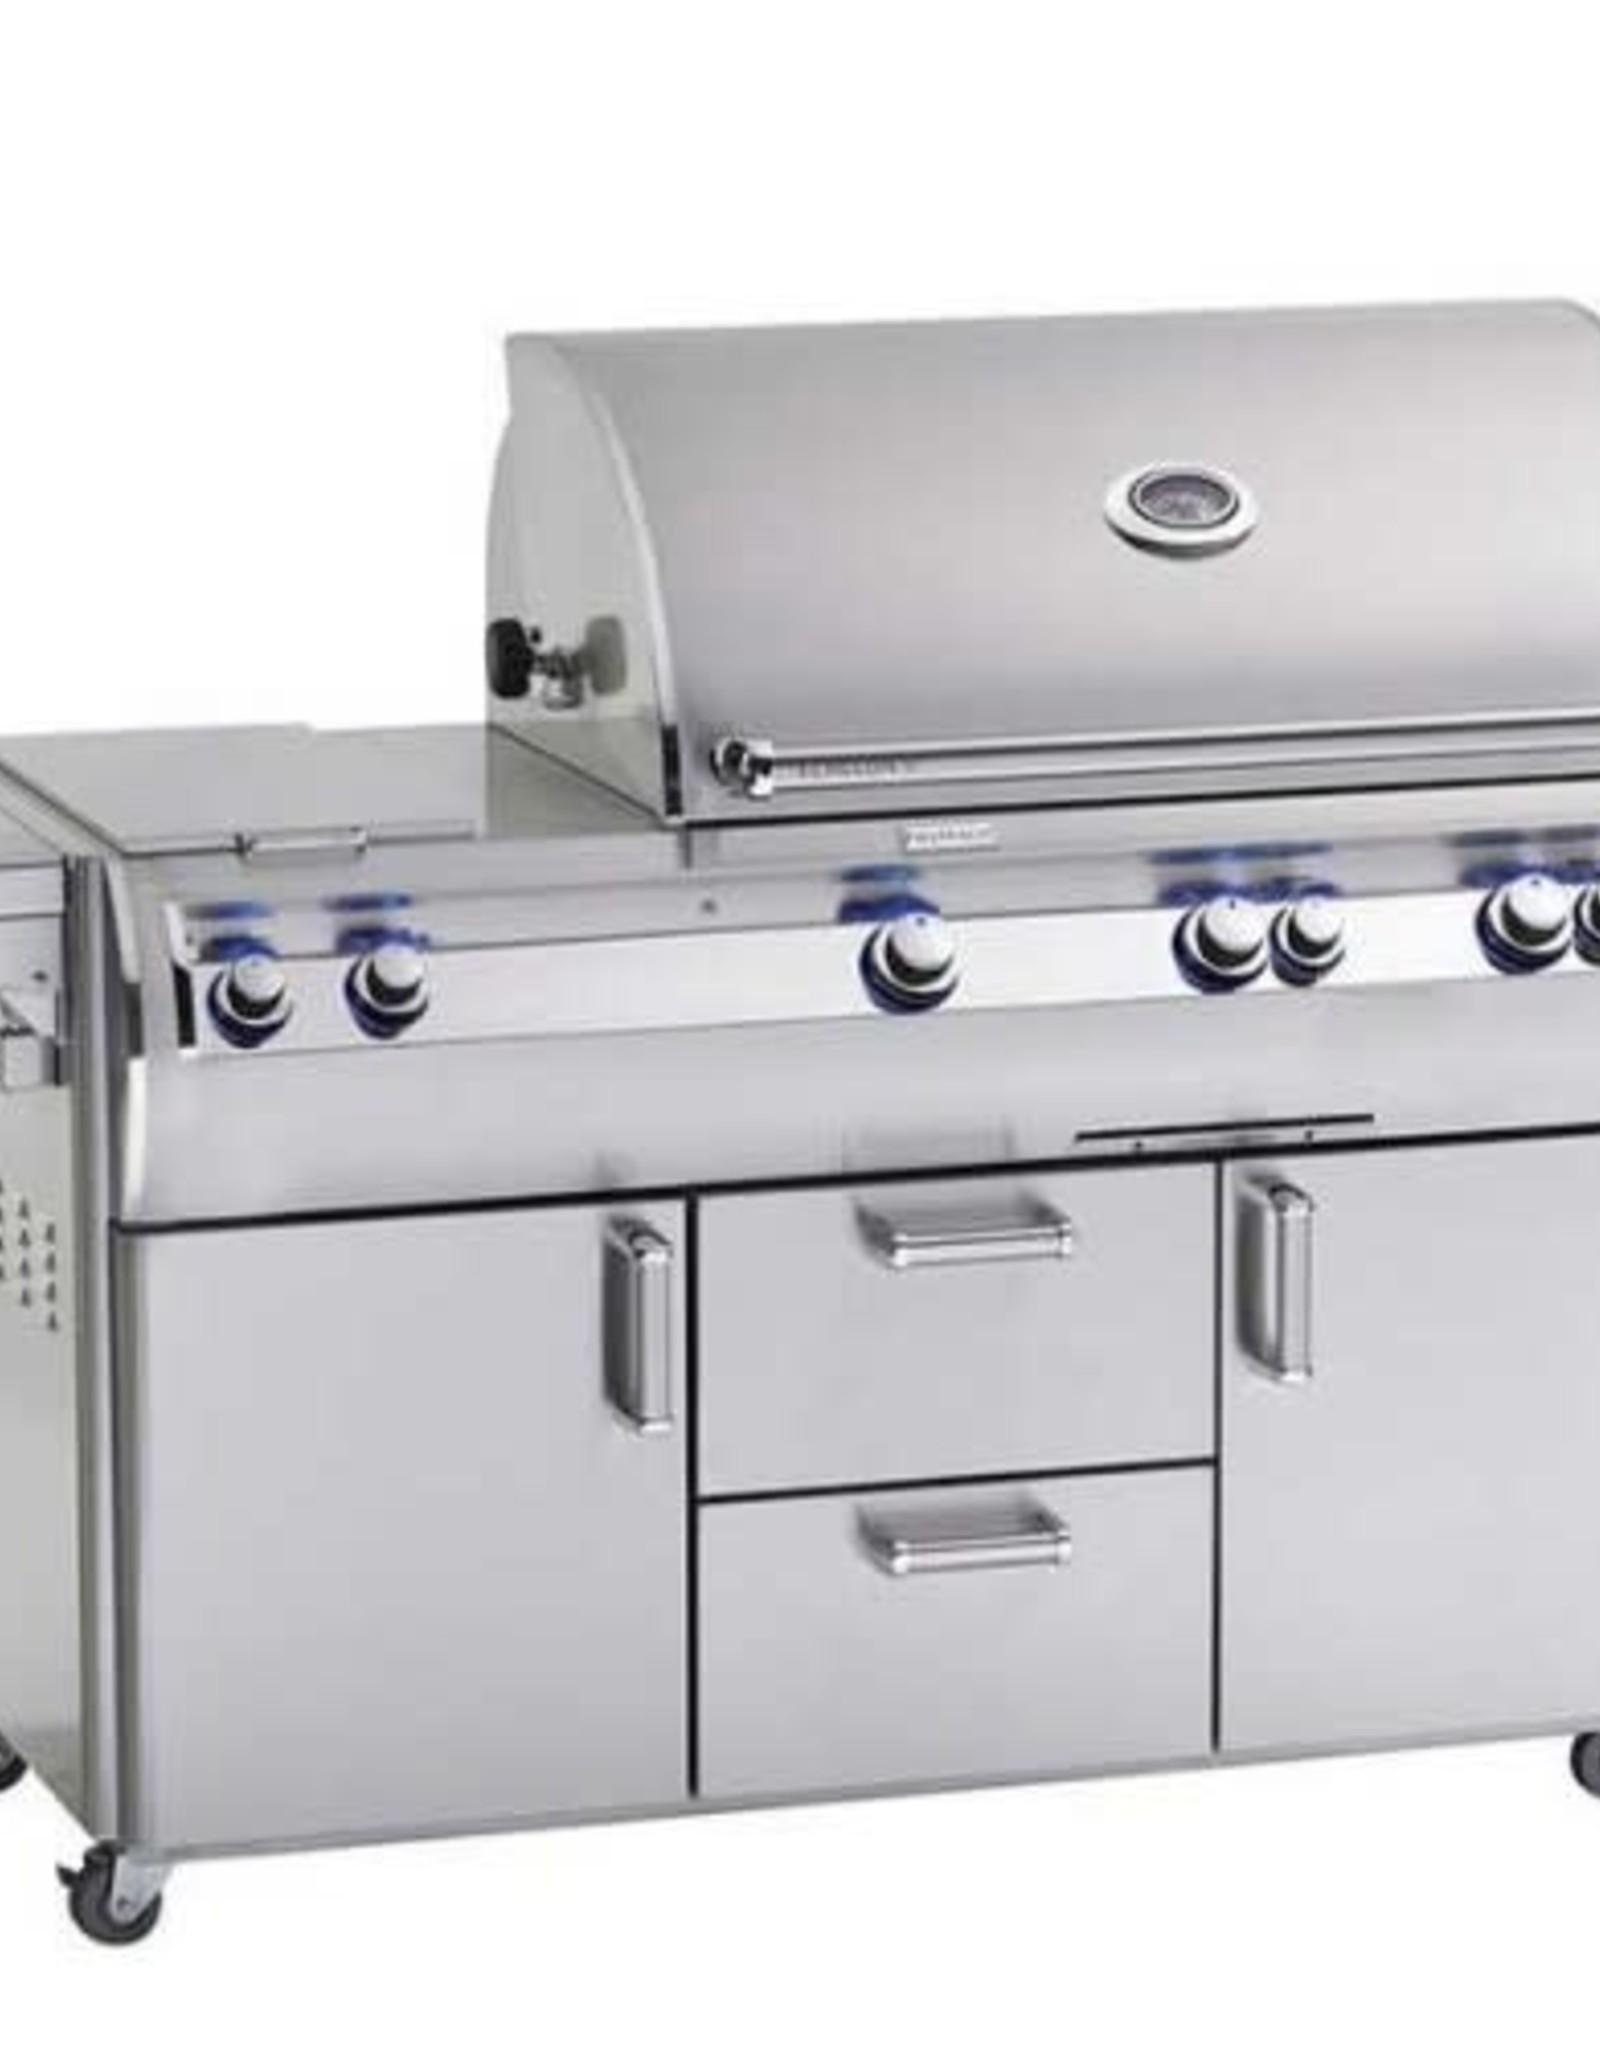 Fire Magic Fire Magic Echelon Diamond E790s 36-inch Cabinet Cart Grill with Double Side Burner (Analog)